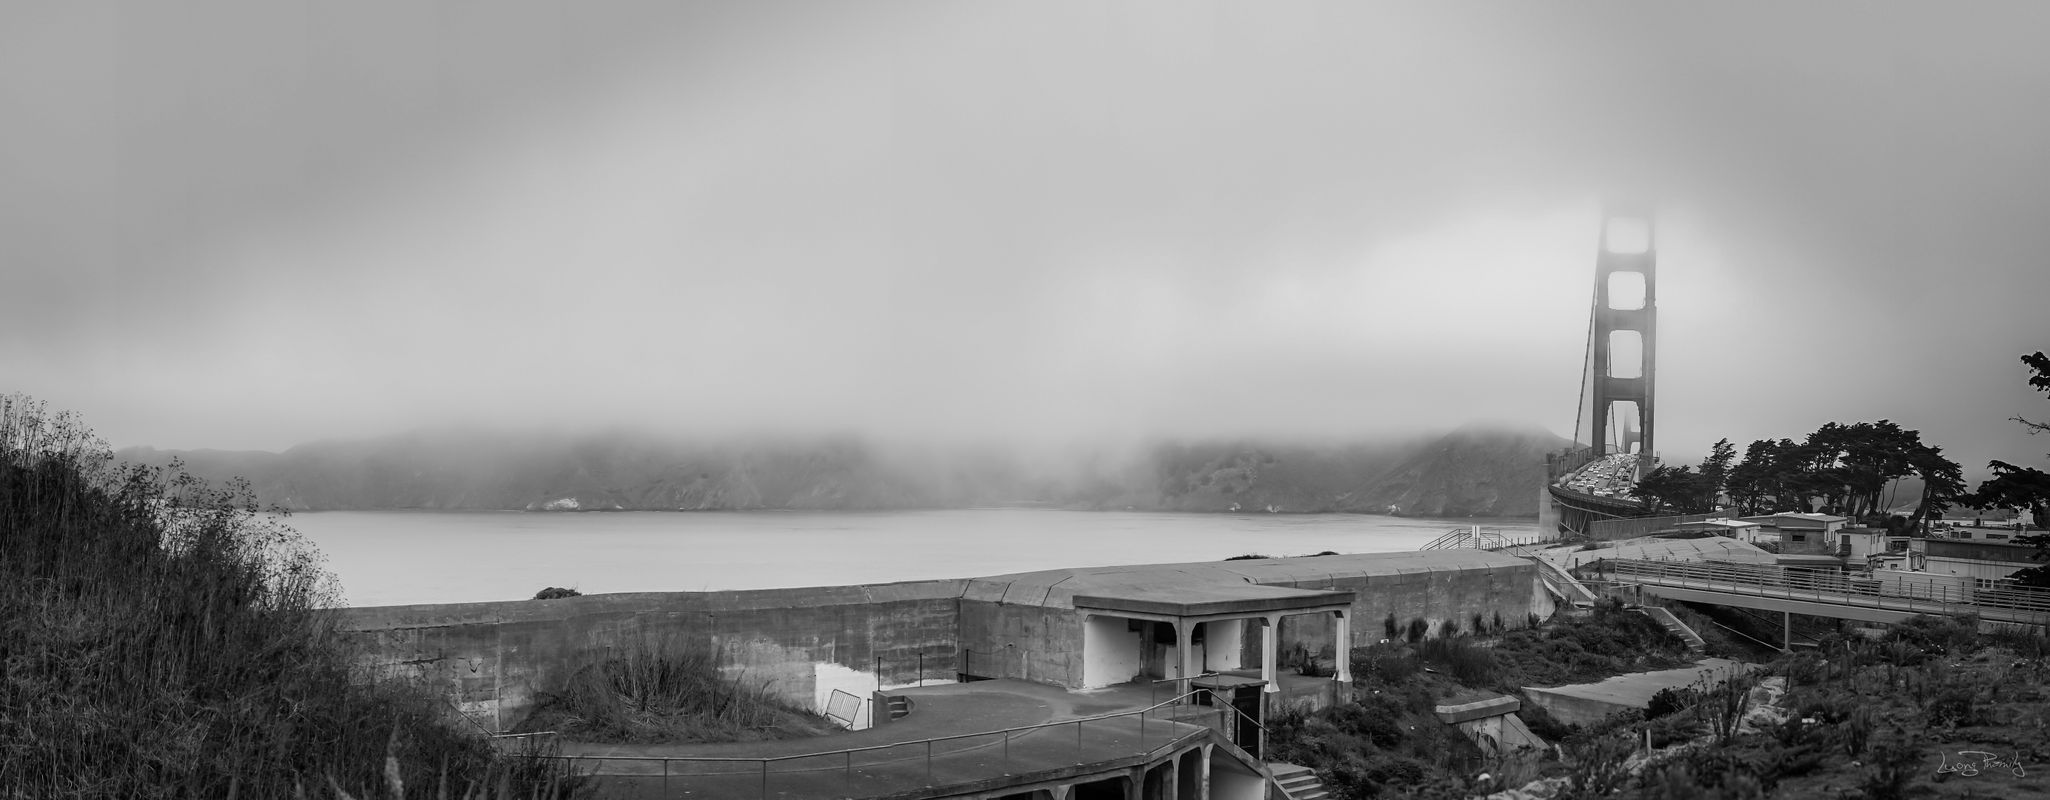 Rush hour fog